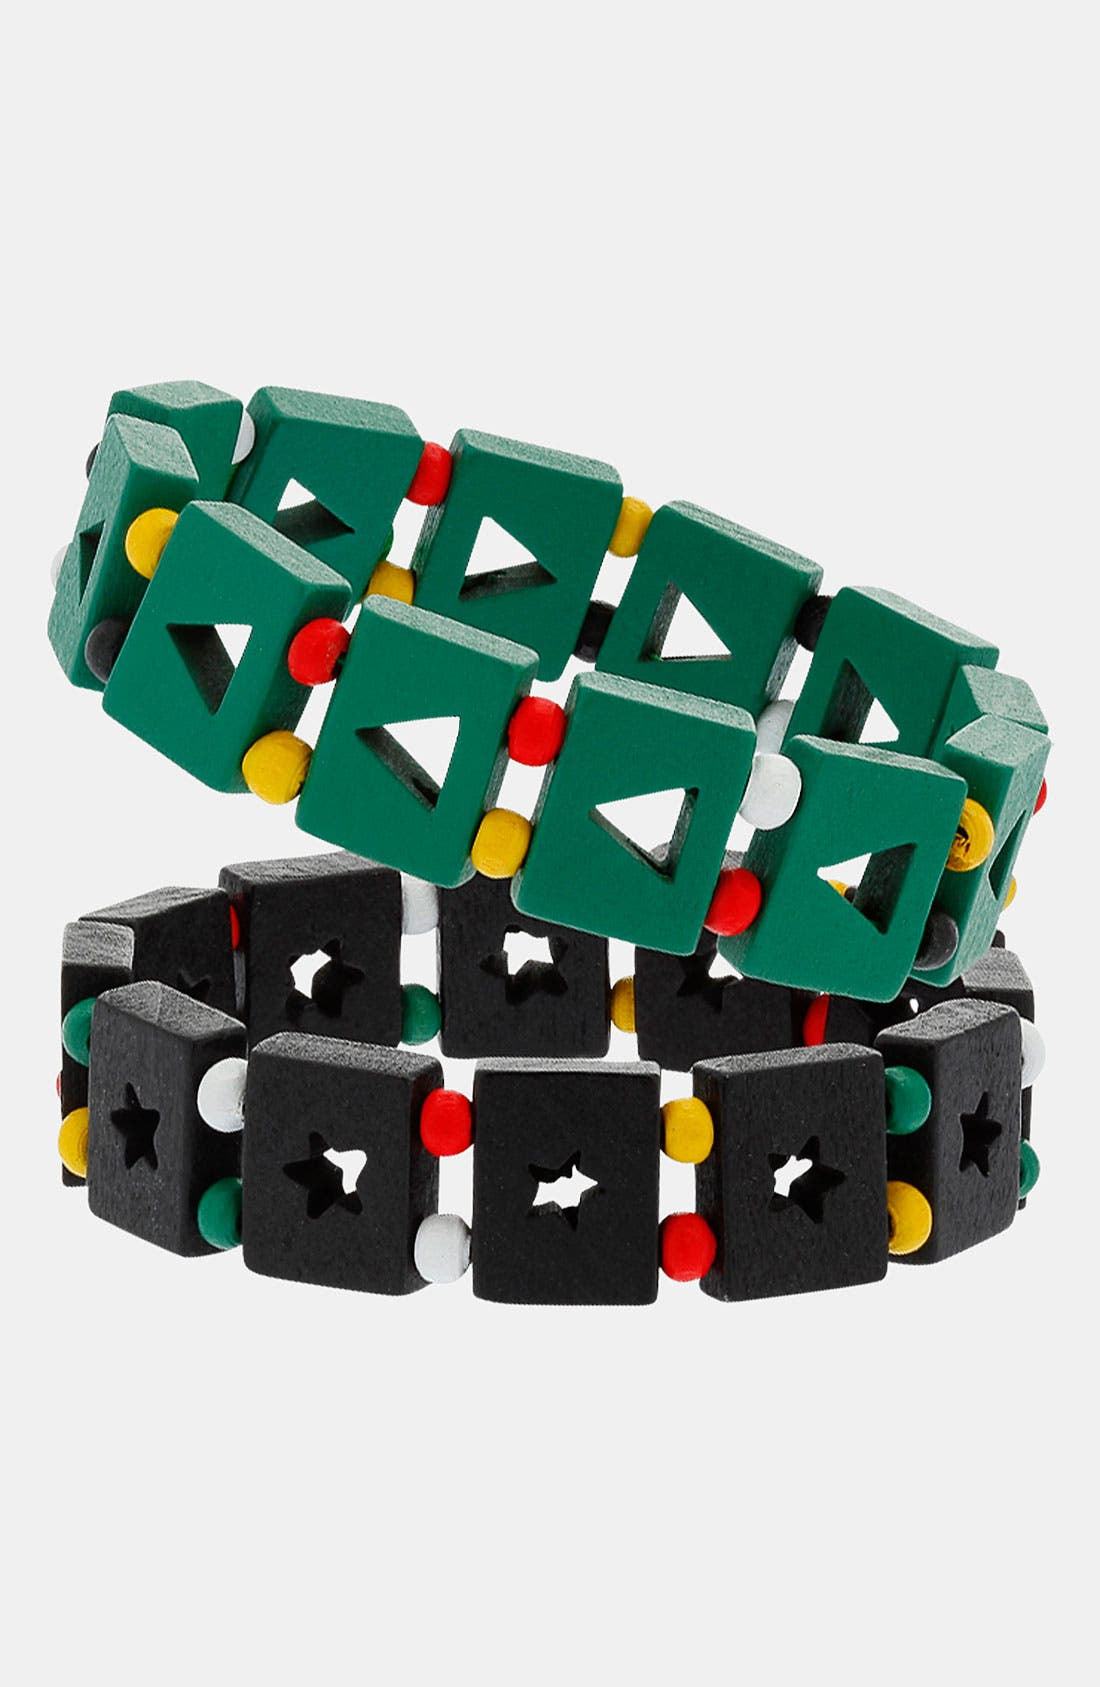 Alternate Image 1 Selected - Topman 'Star & Triangle' Cutout Stretch Bracelets (Set of 2)